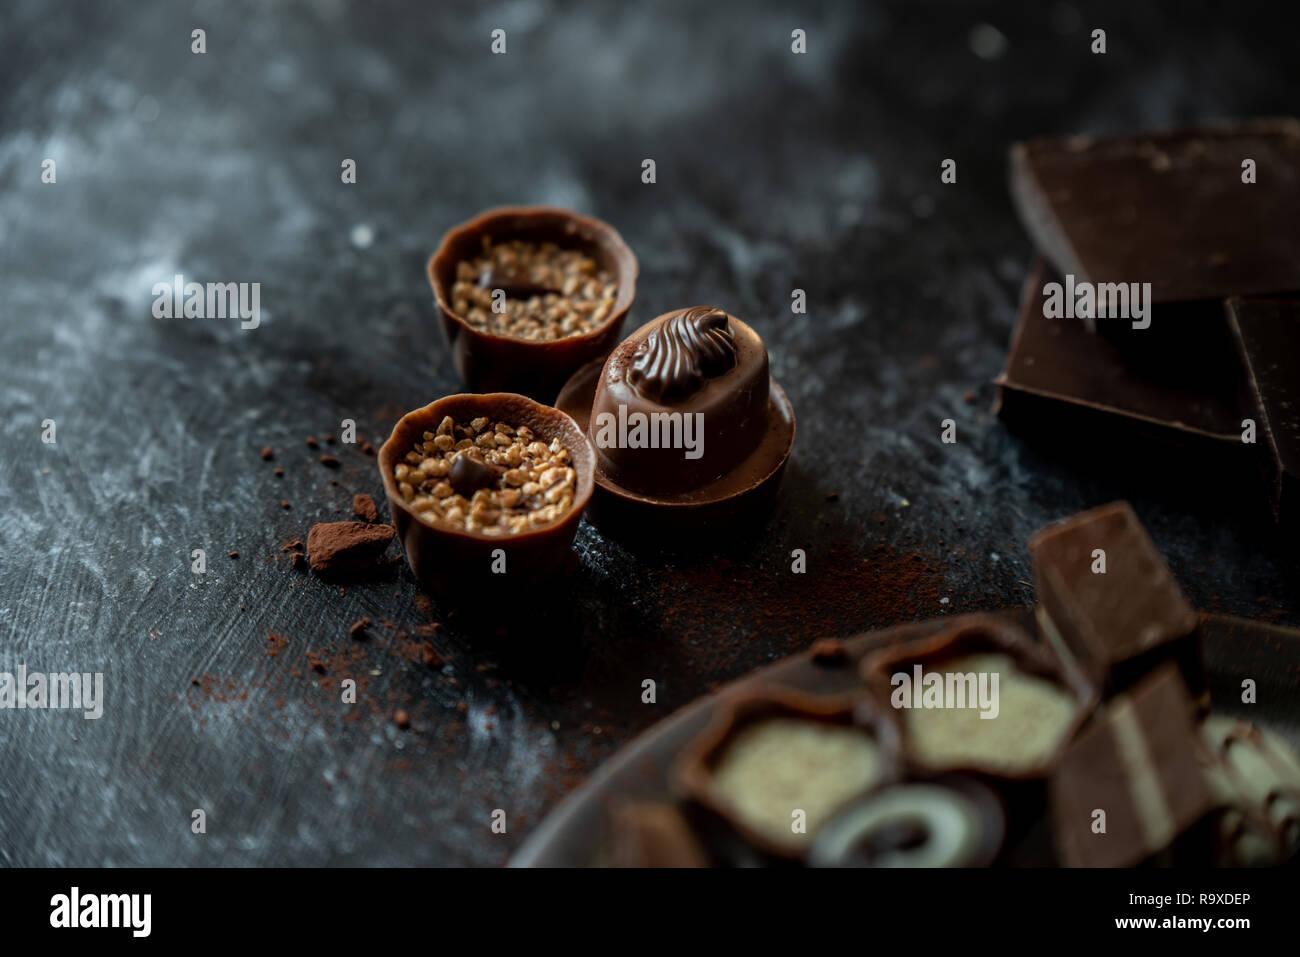 different, sweet pralines of dark, milk and white chocolate on a dark, wooden background Stock Photo